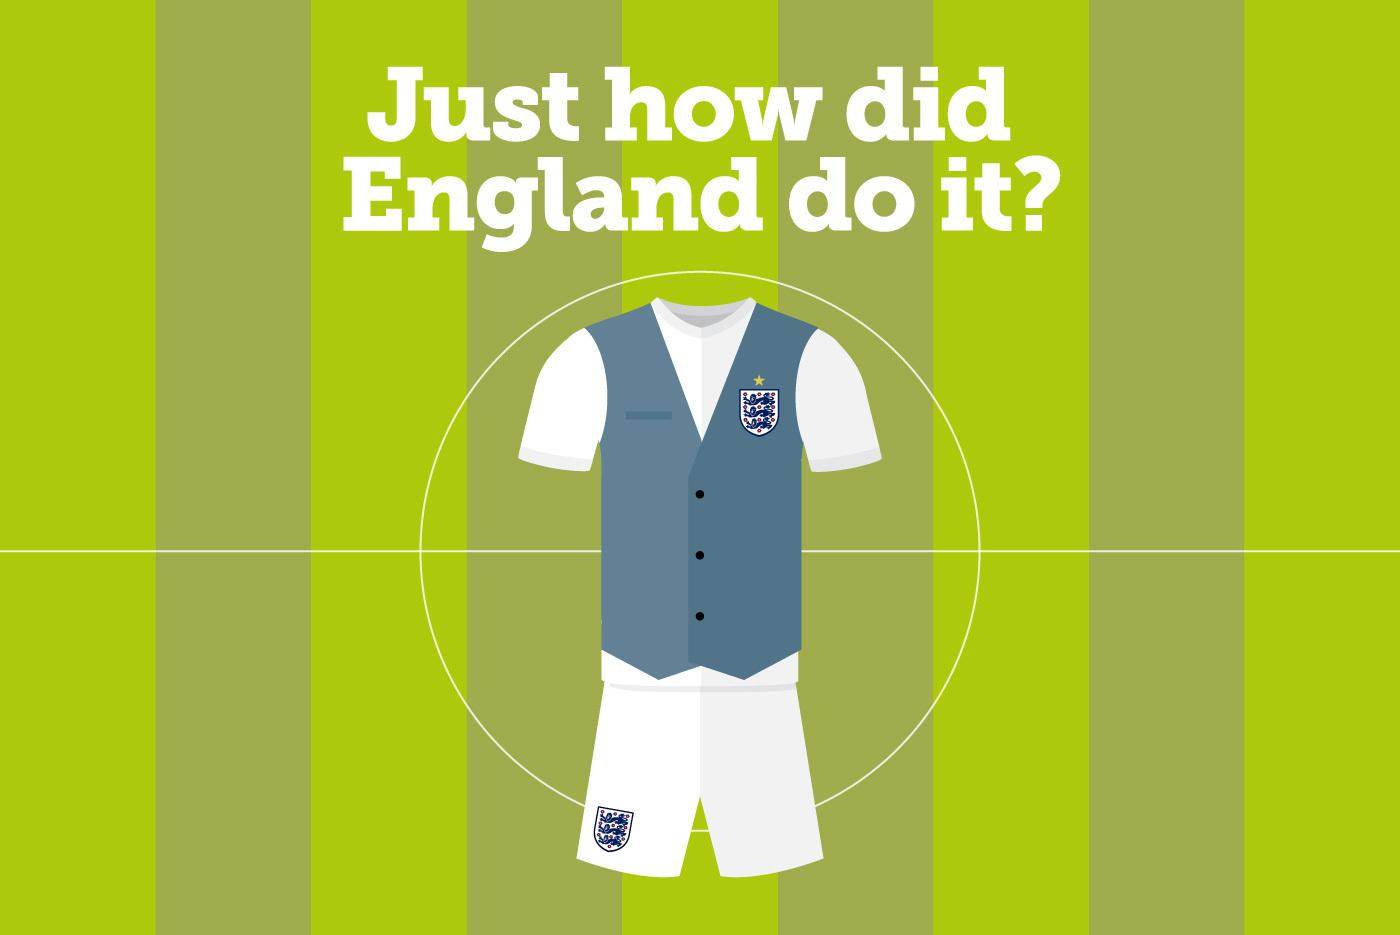 Englands world cup success article header